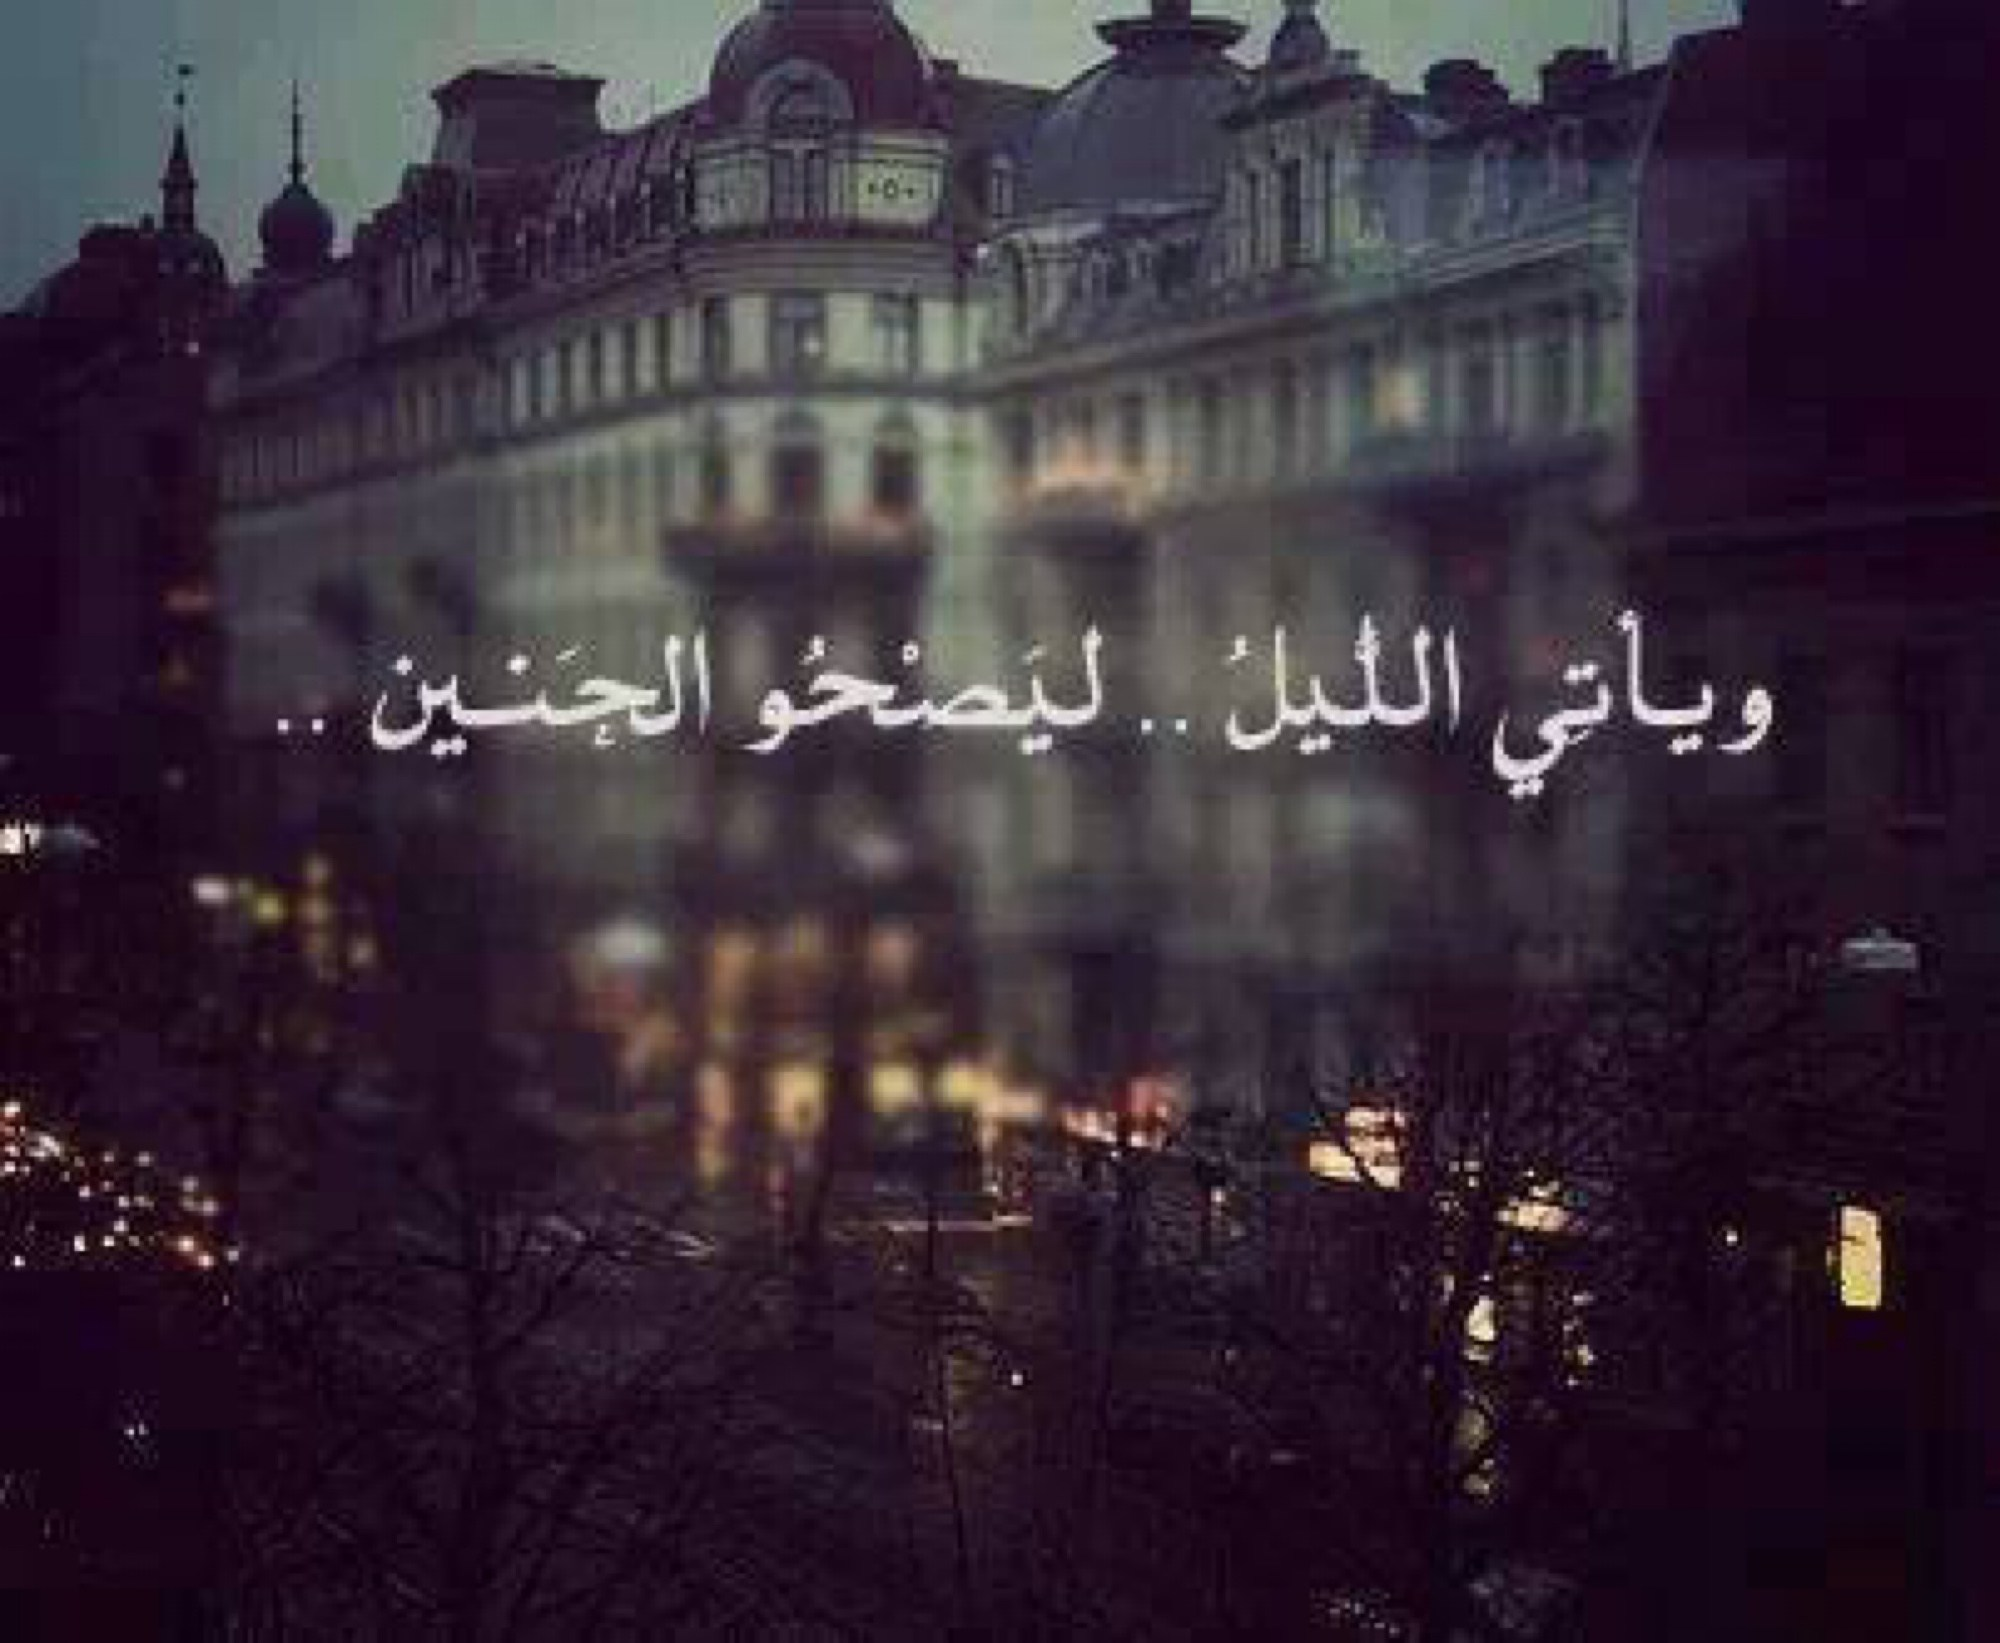 MohammedAhmadAlHashaisha's Cover Photo